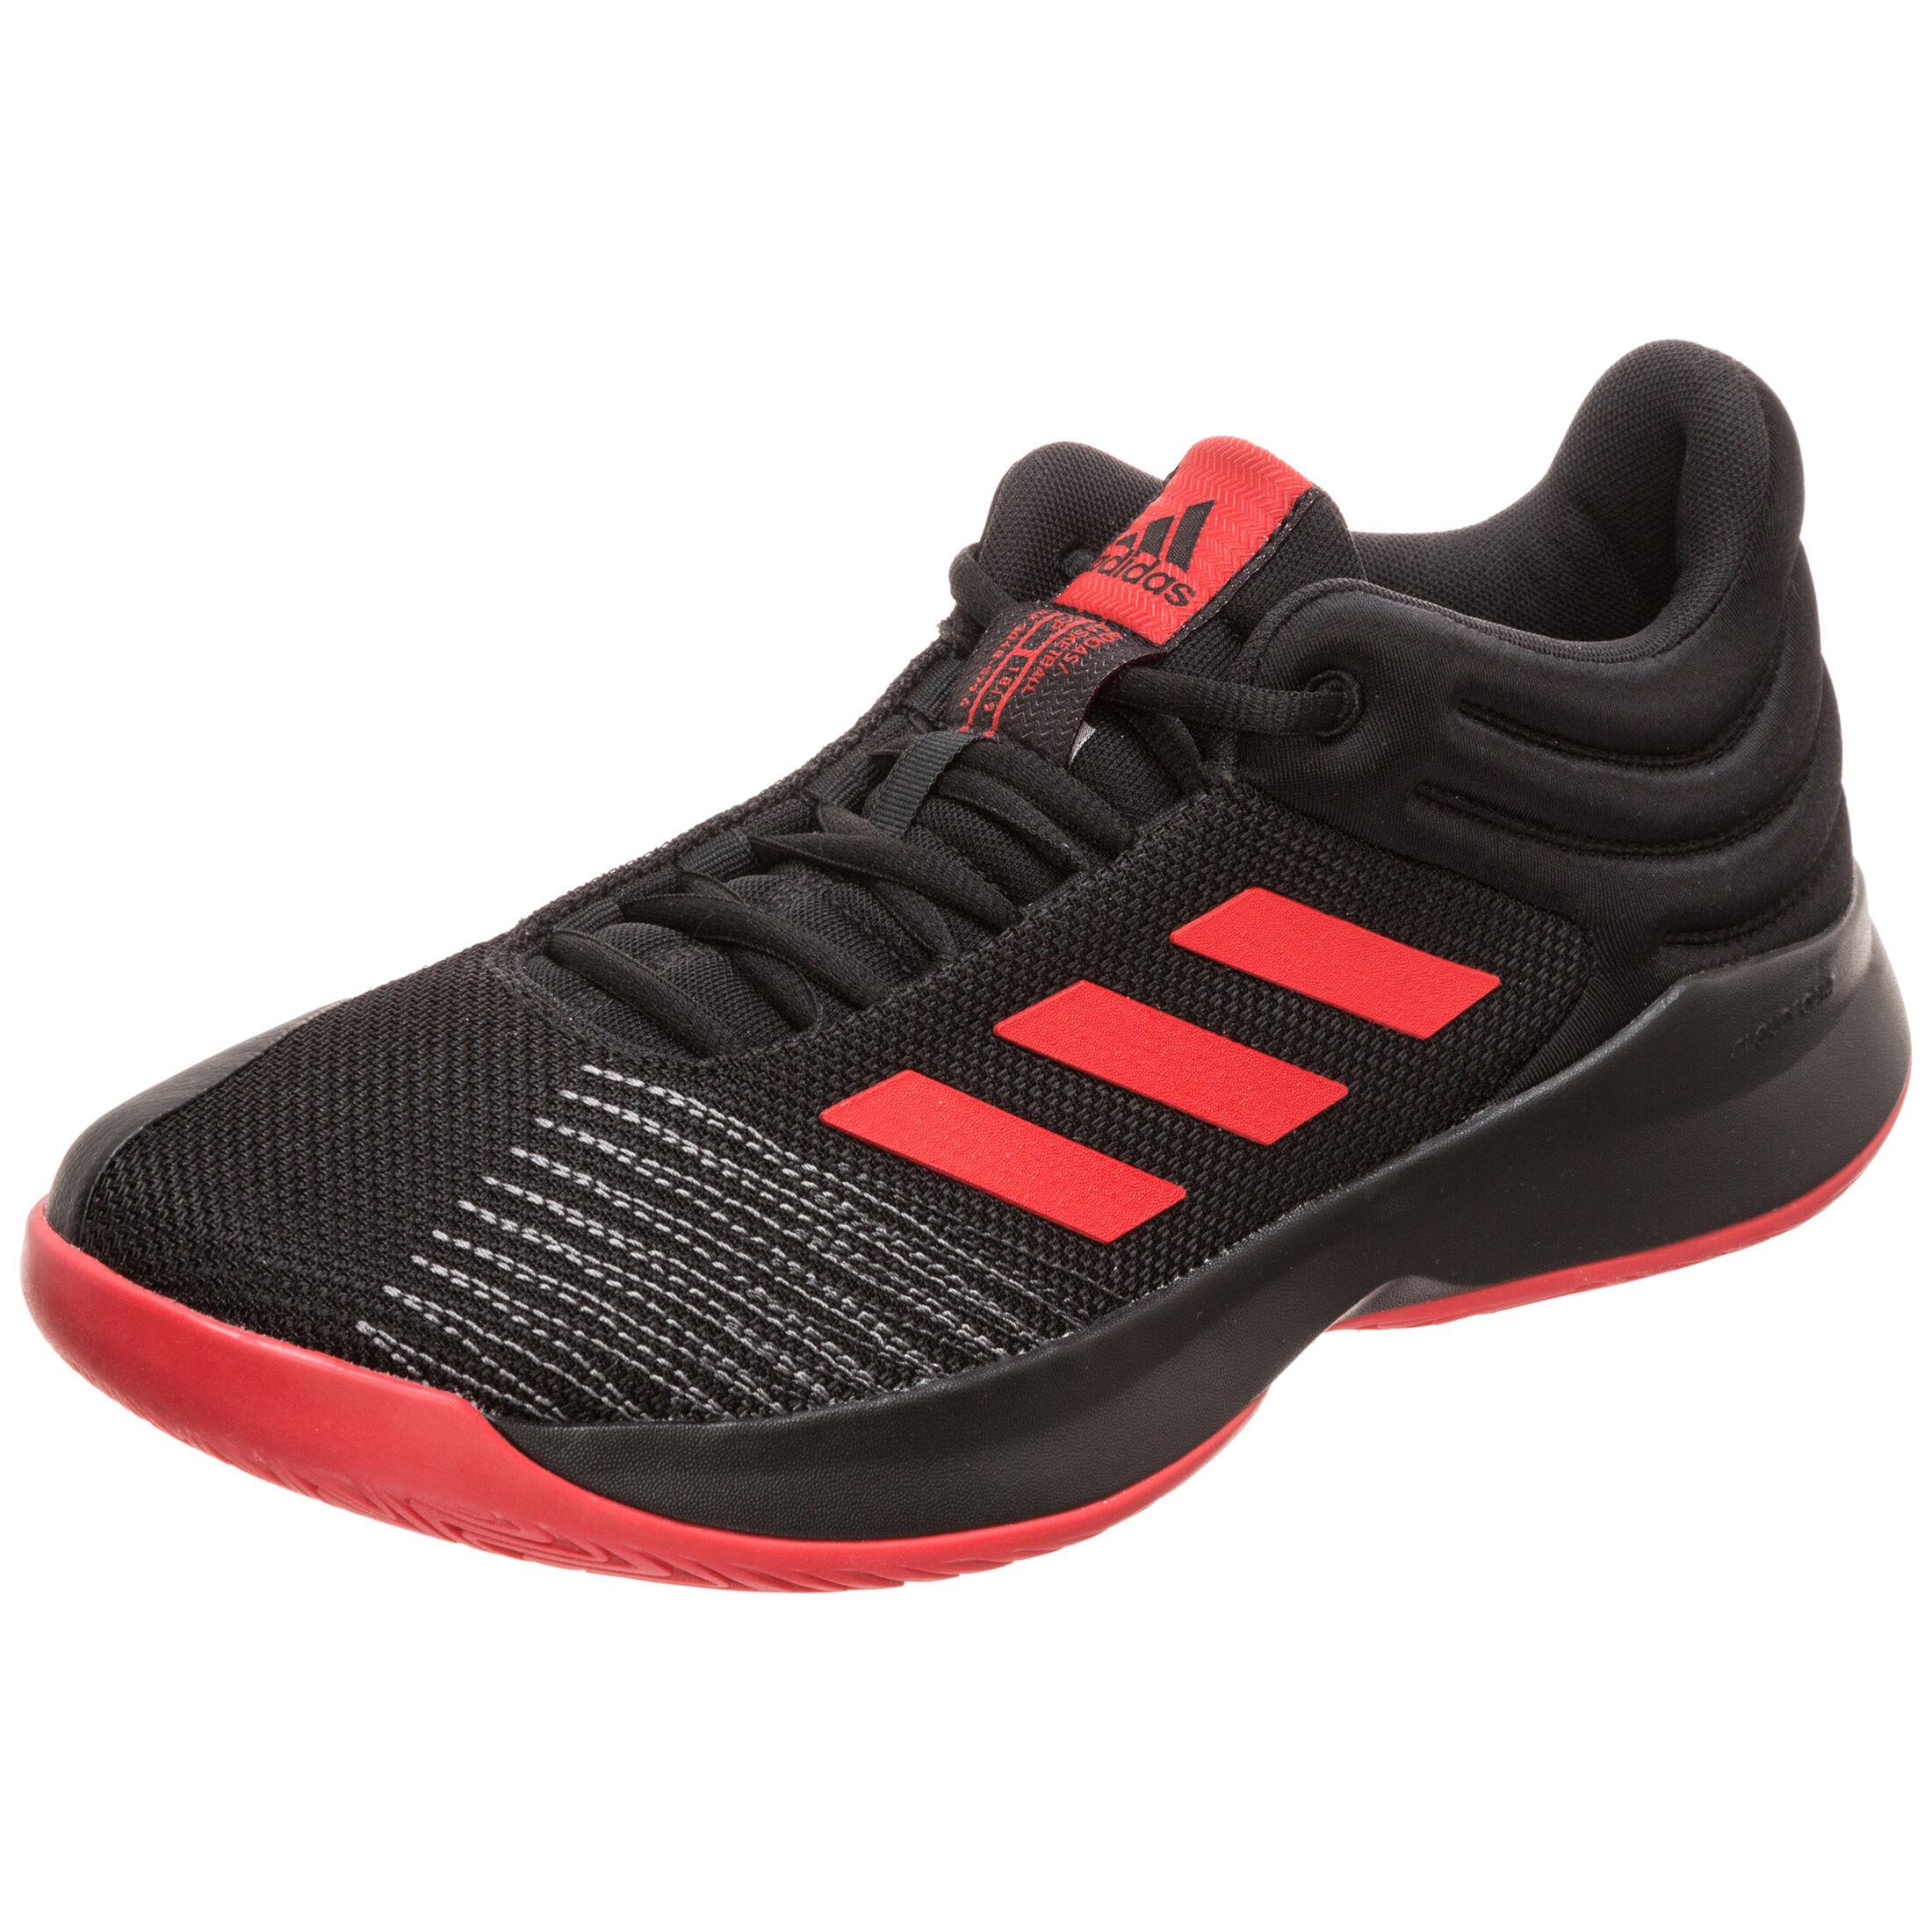 Outfitter Bei Adidas Kaufen Basketballschuhe PerformanceBasketball nOvwP0Nym8